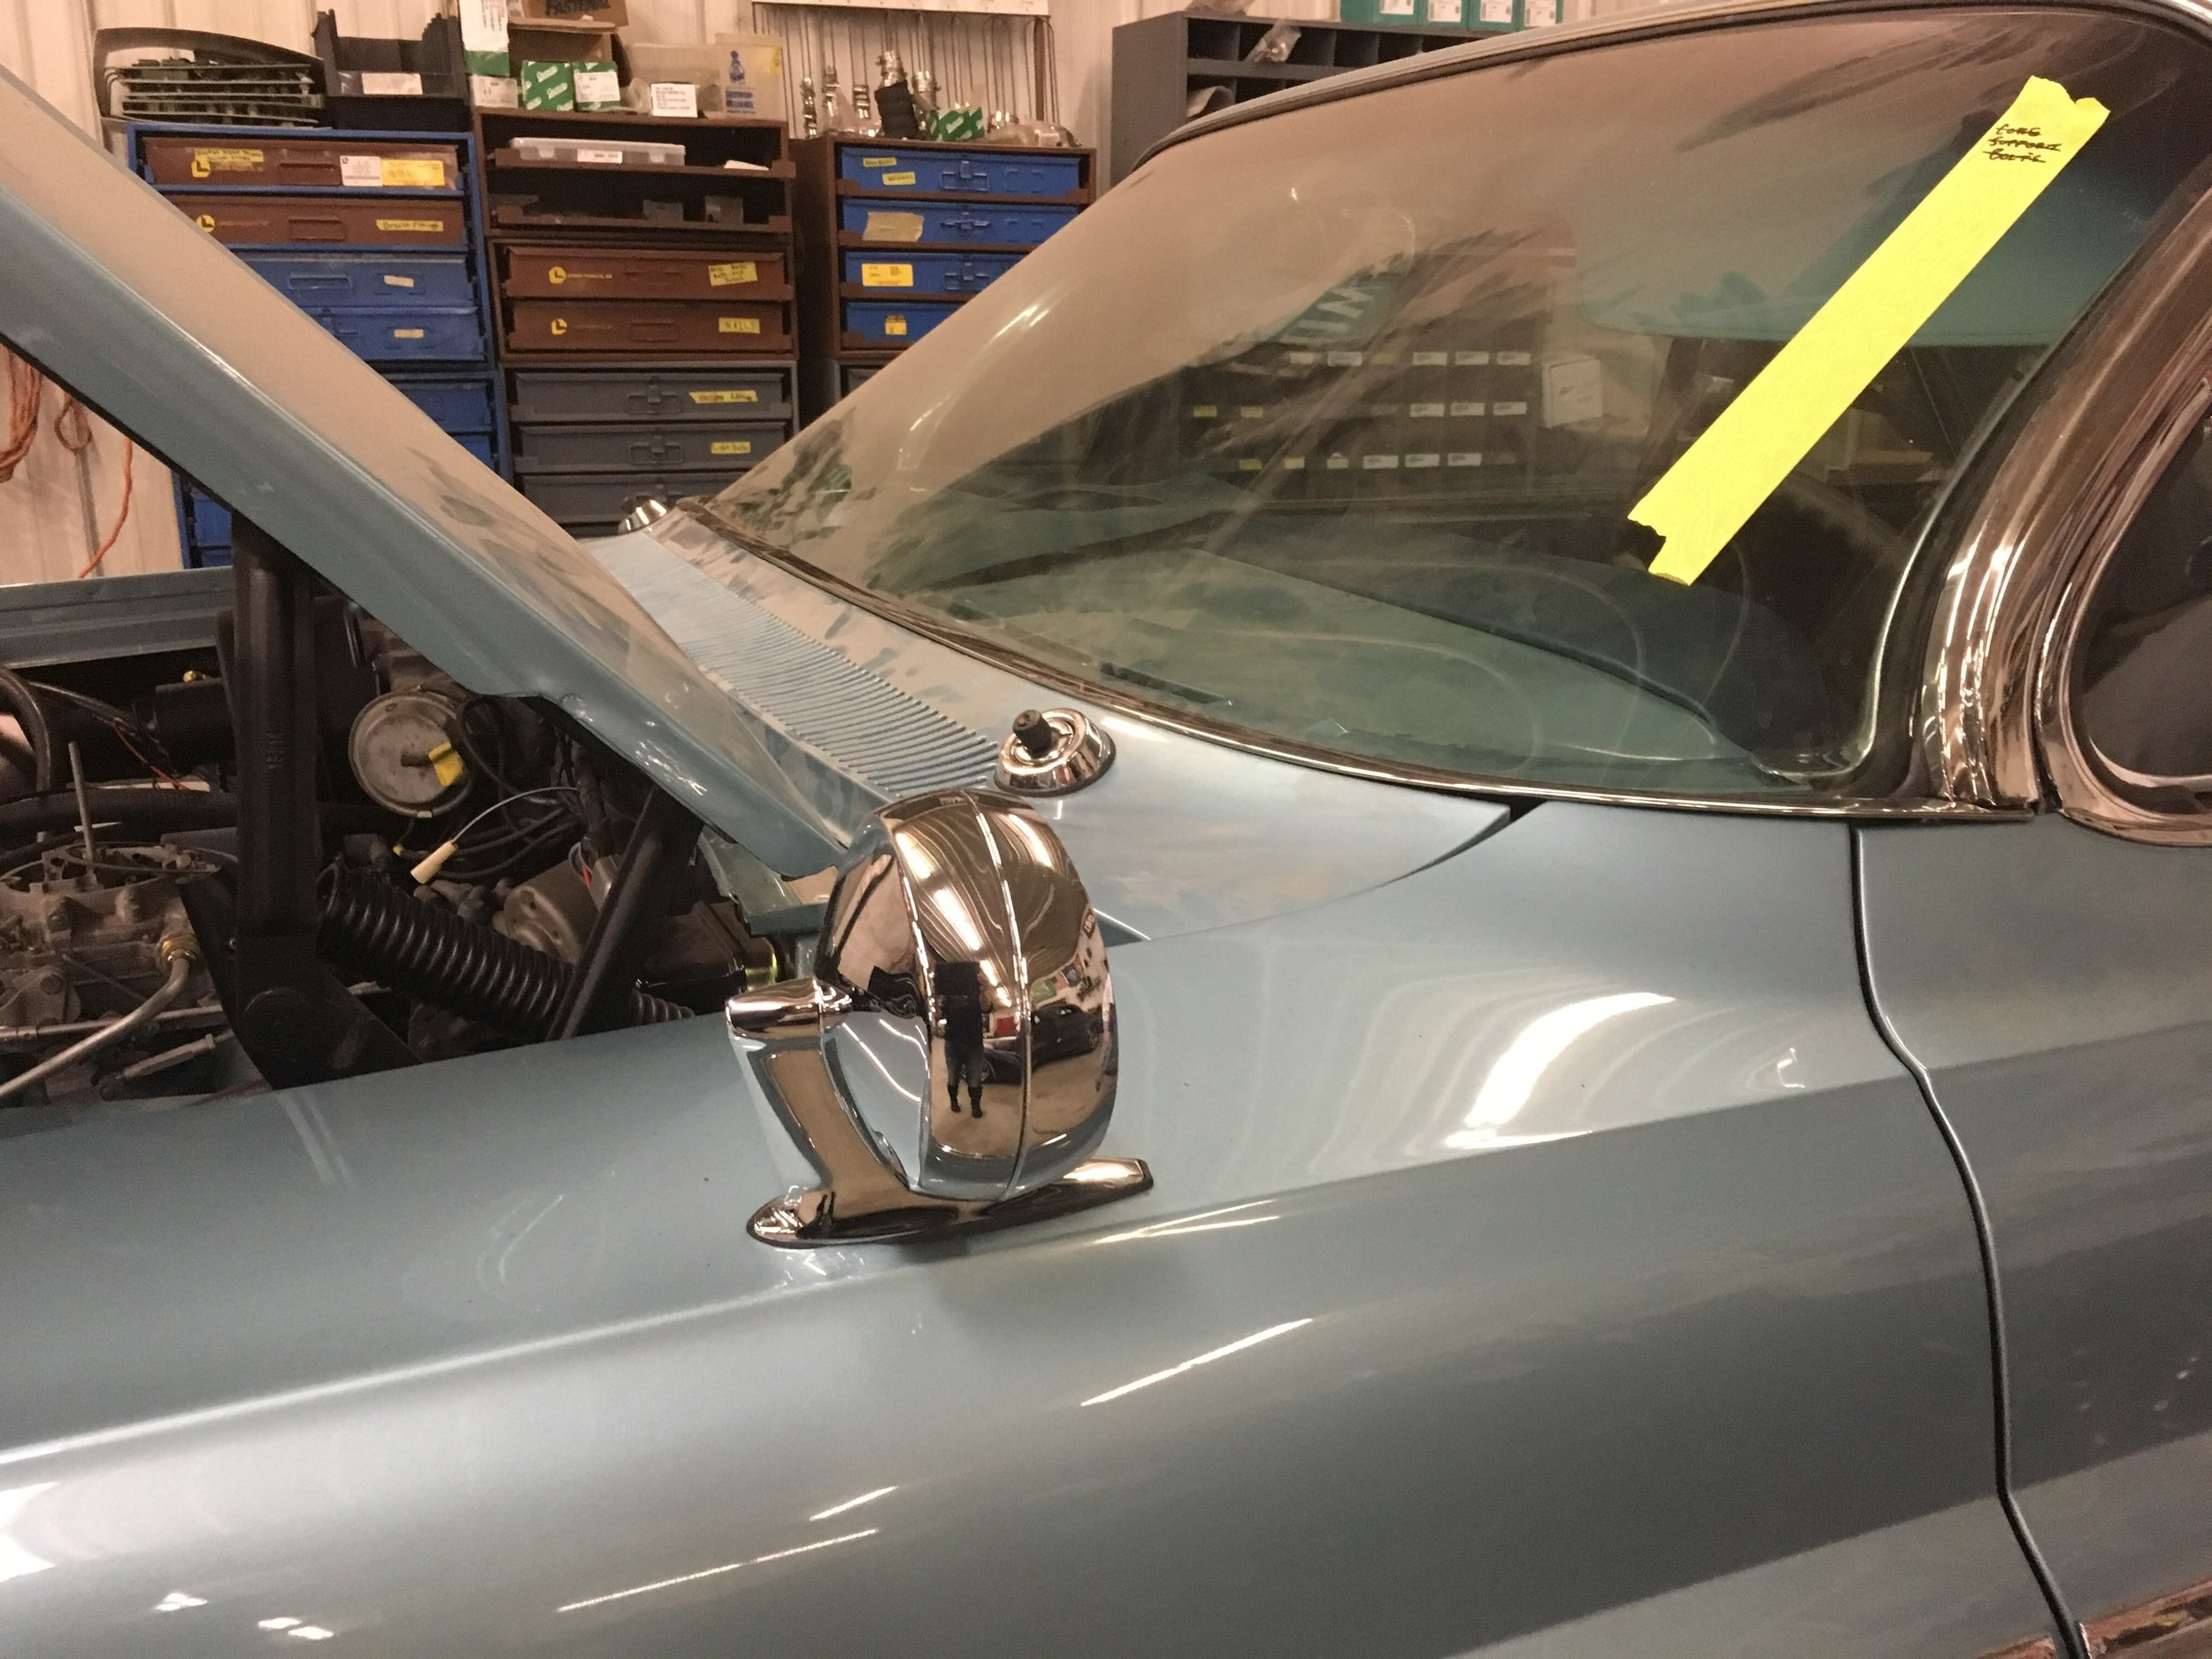 1962-Pontiac-Bonneville-minneapolis-hot-rod-custom-build-restoration-mirrors.jpg